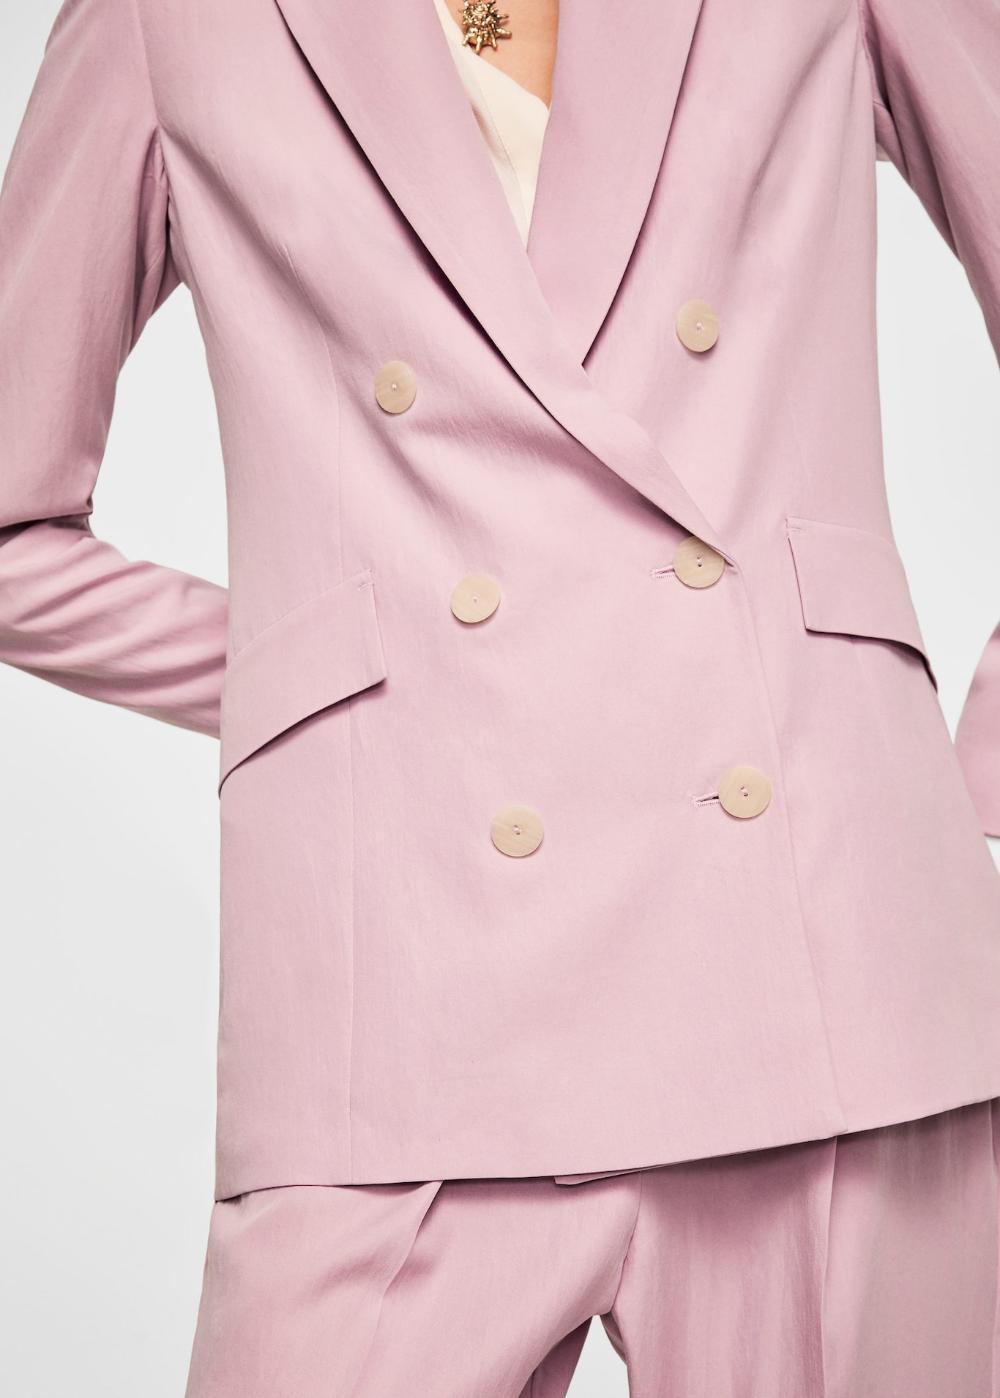 Anzugjacke - Damen  OUTLET Schweiz  Anzugjacke, Anzug jacke, Jacken